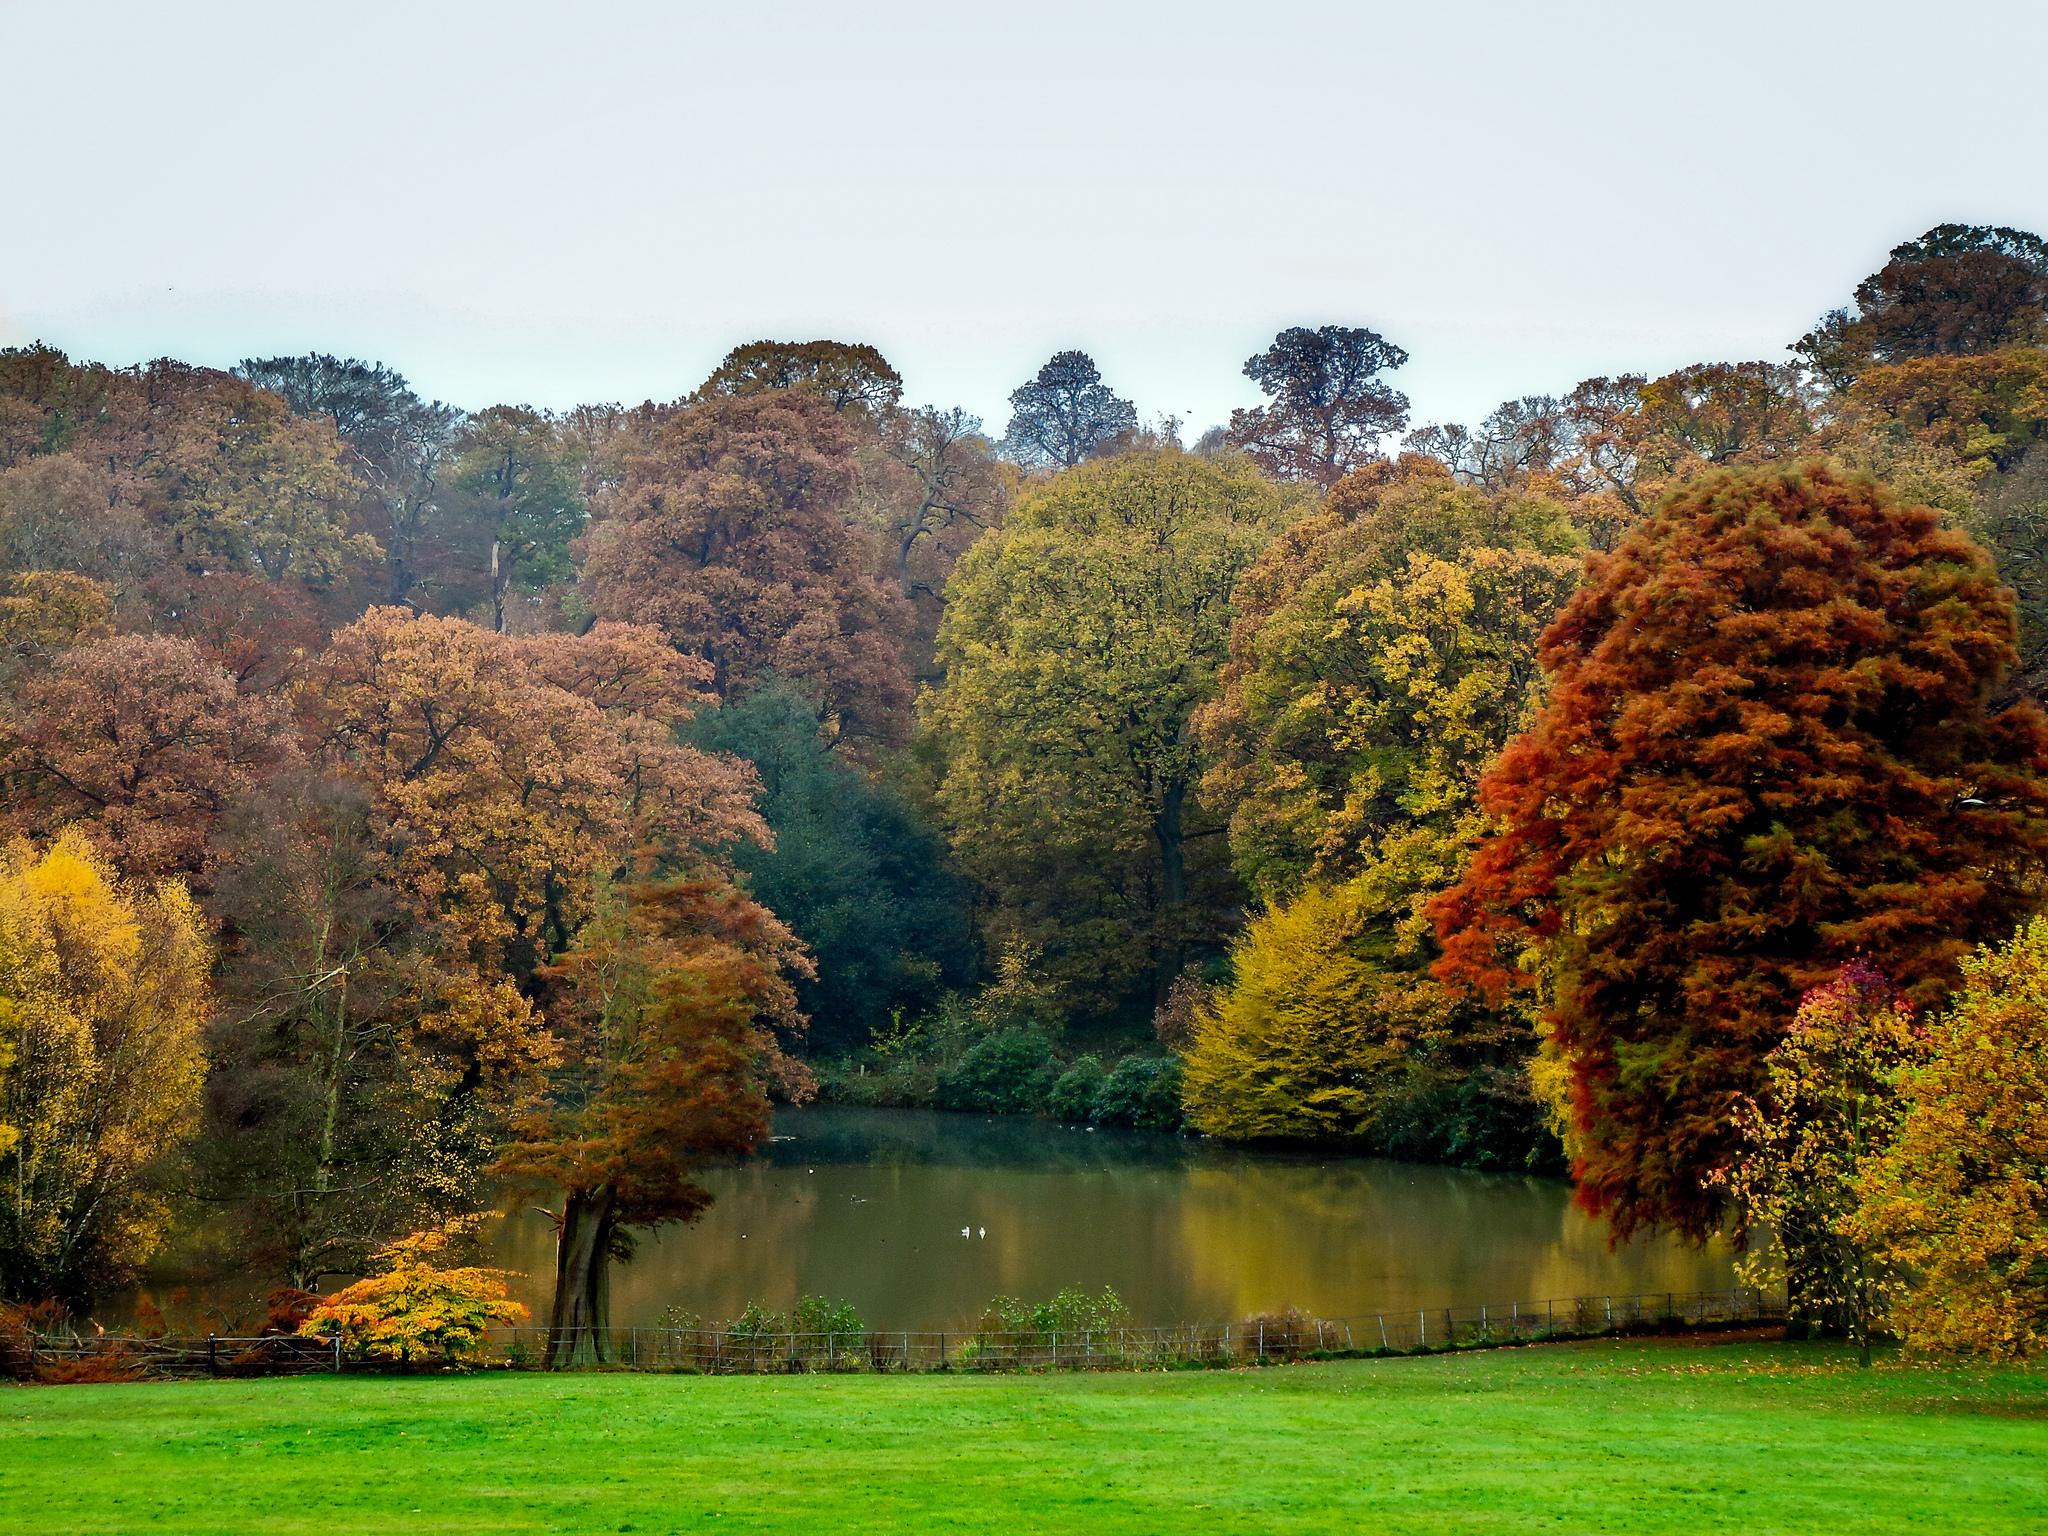 New England Fall Desktop Wallpaper Five Great Autumn Park And Pub Walks In London